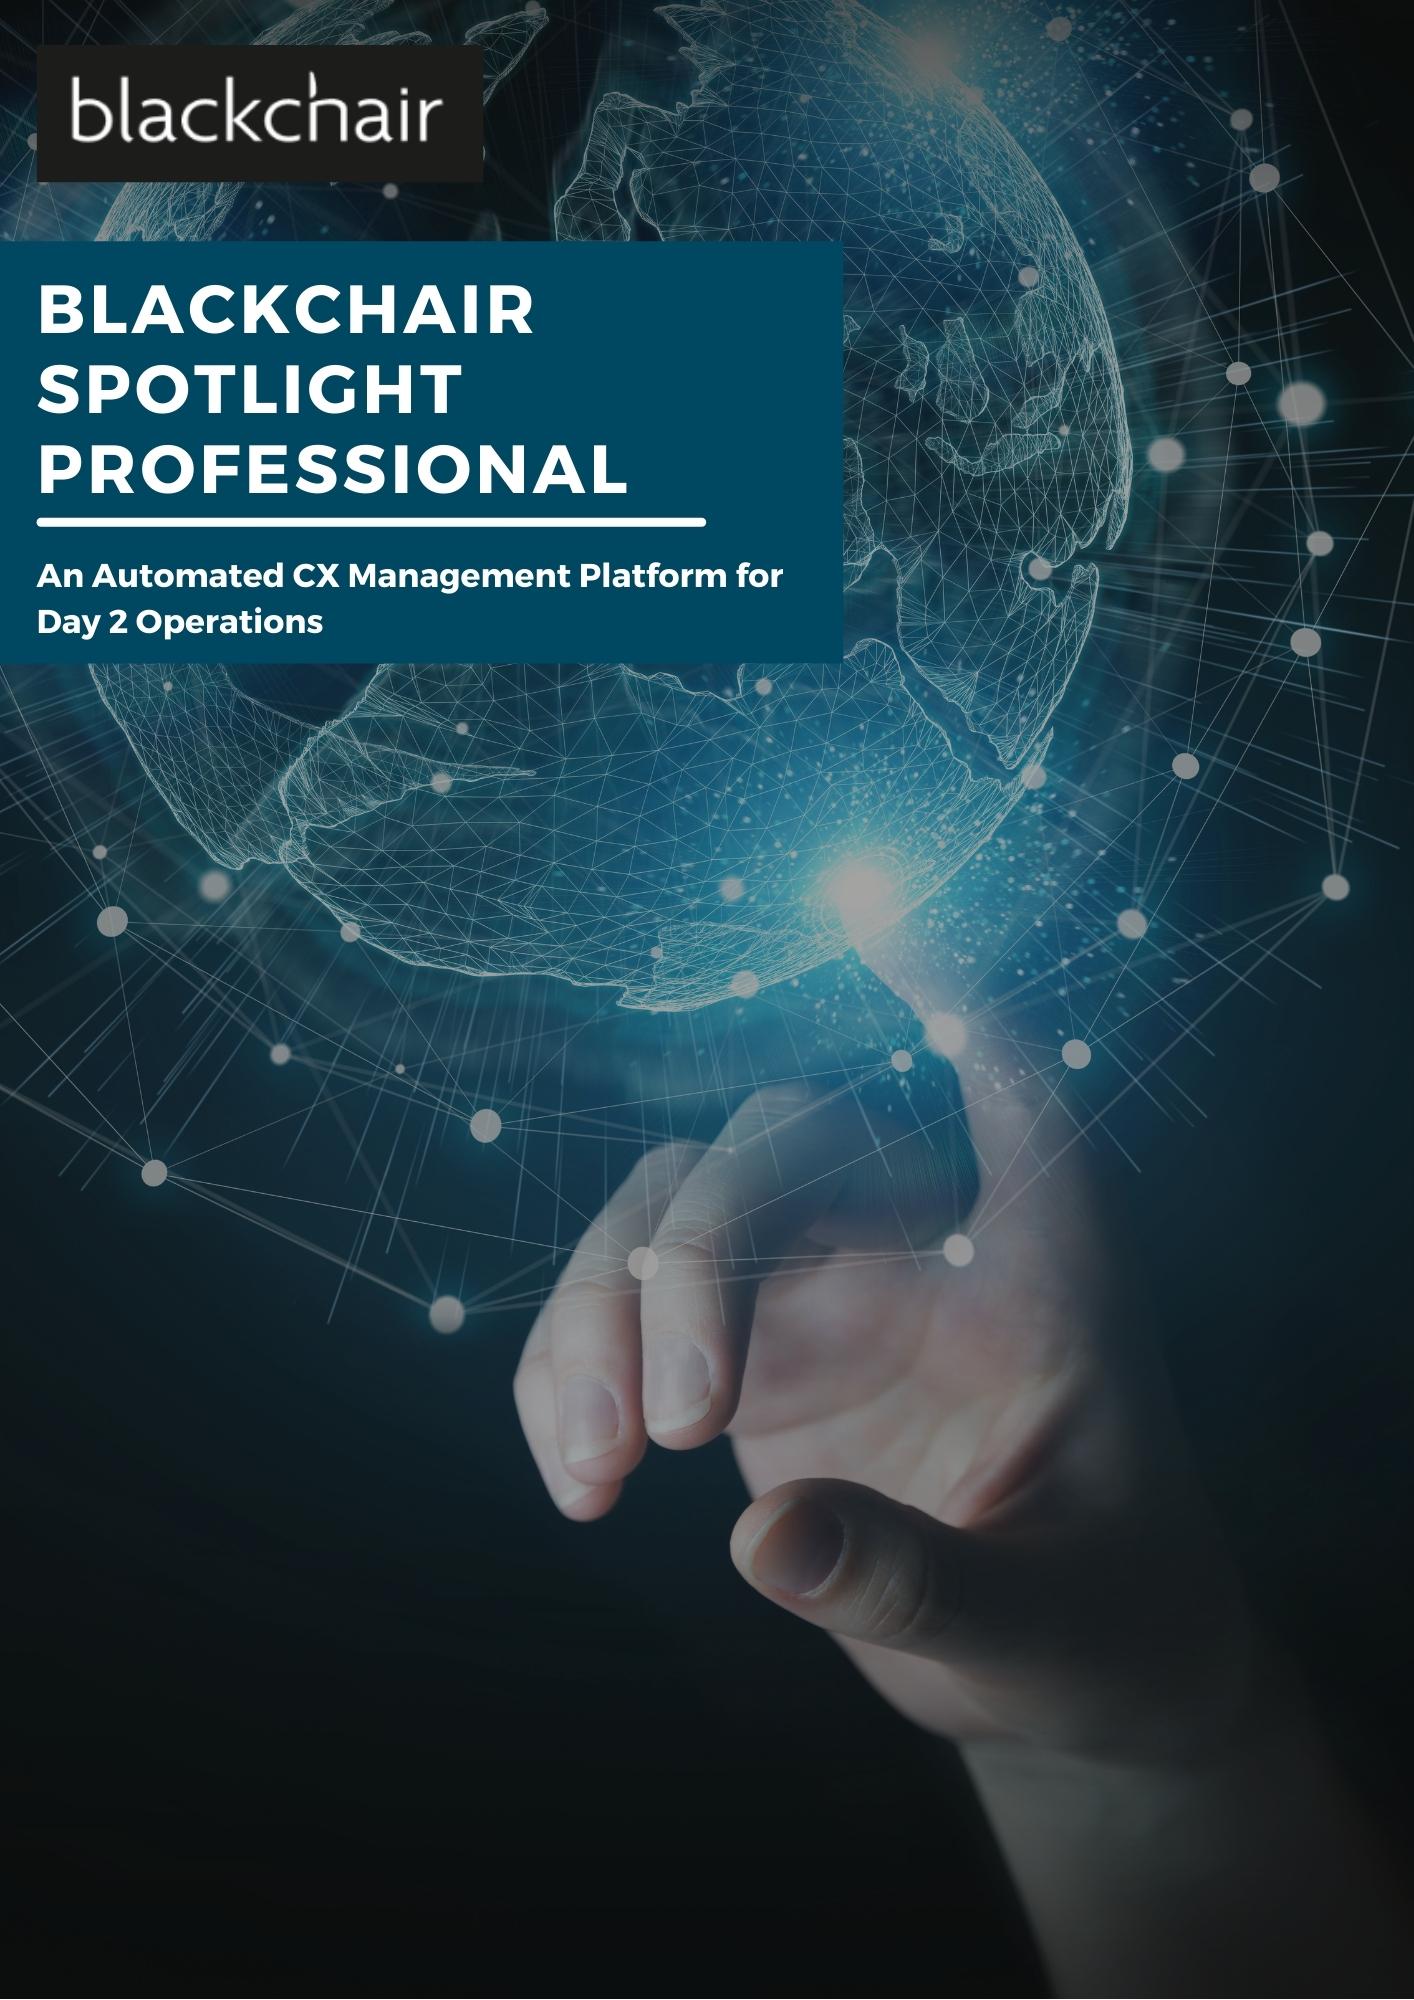 Blackchair - Brochures - Spotlight Professional